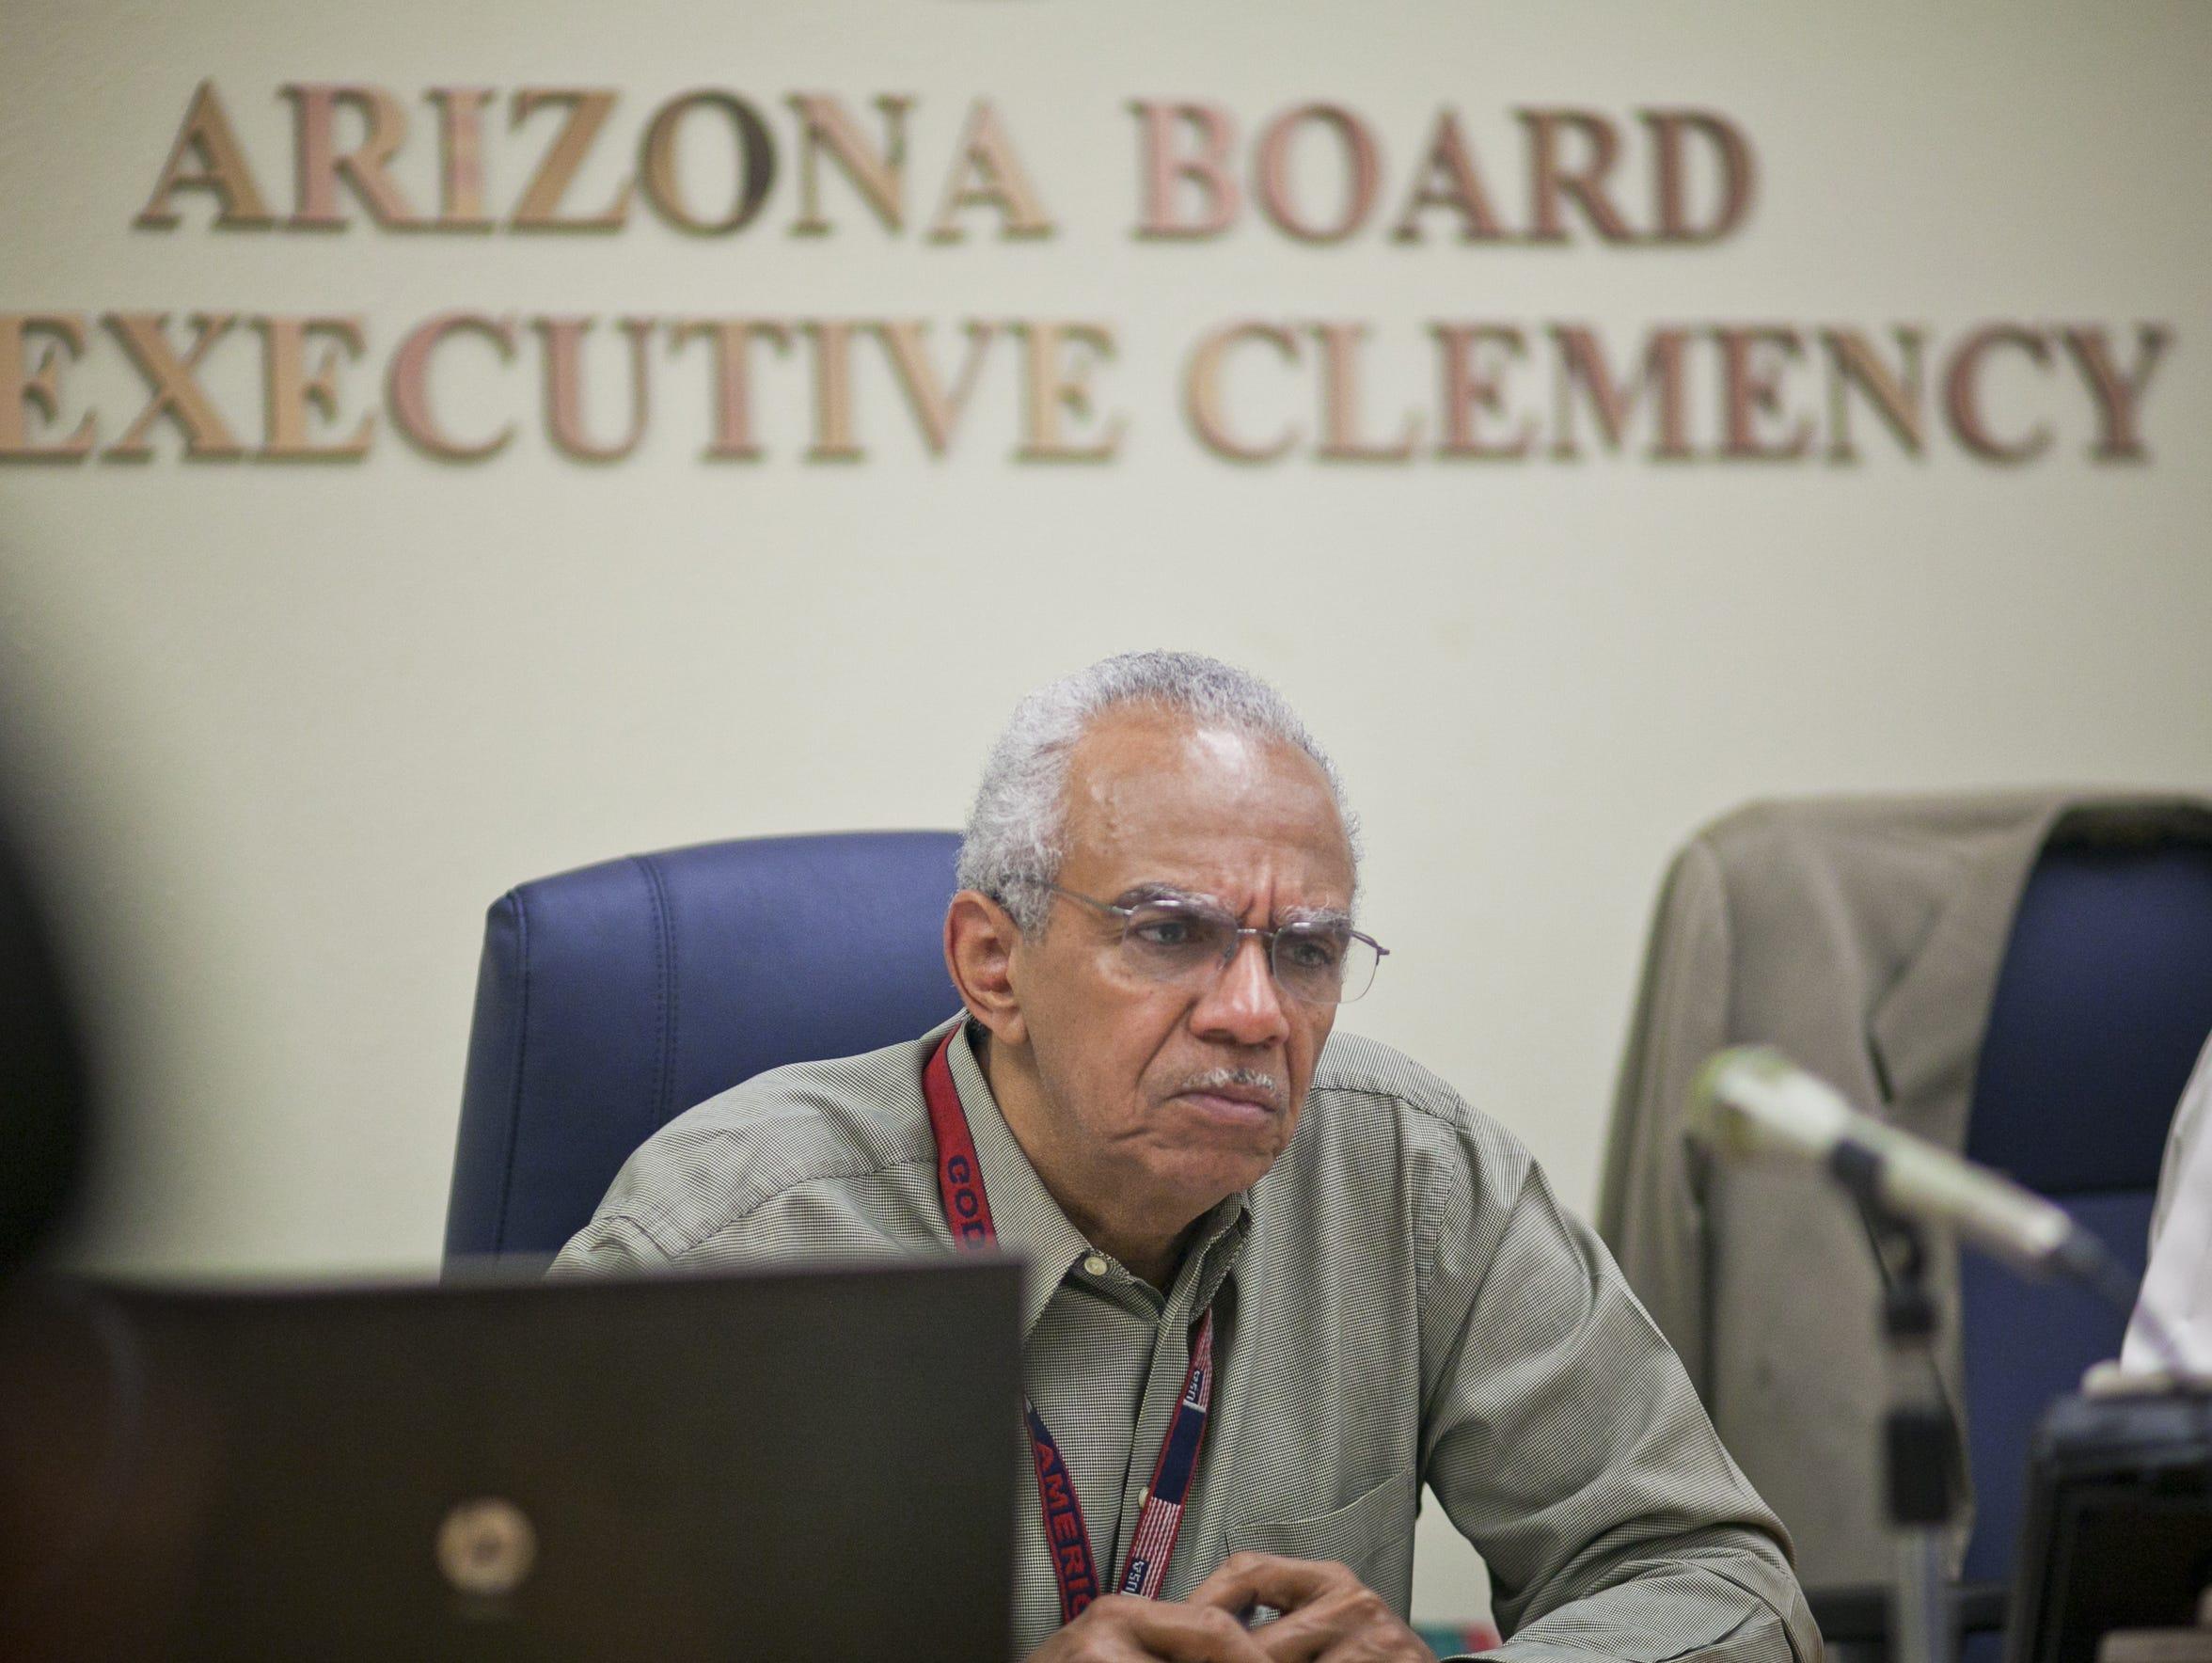 Duane Belcher, chairman of the Arizona Board of Executive